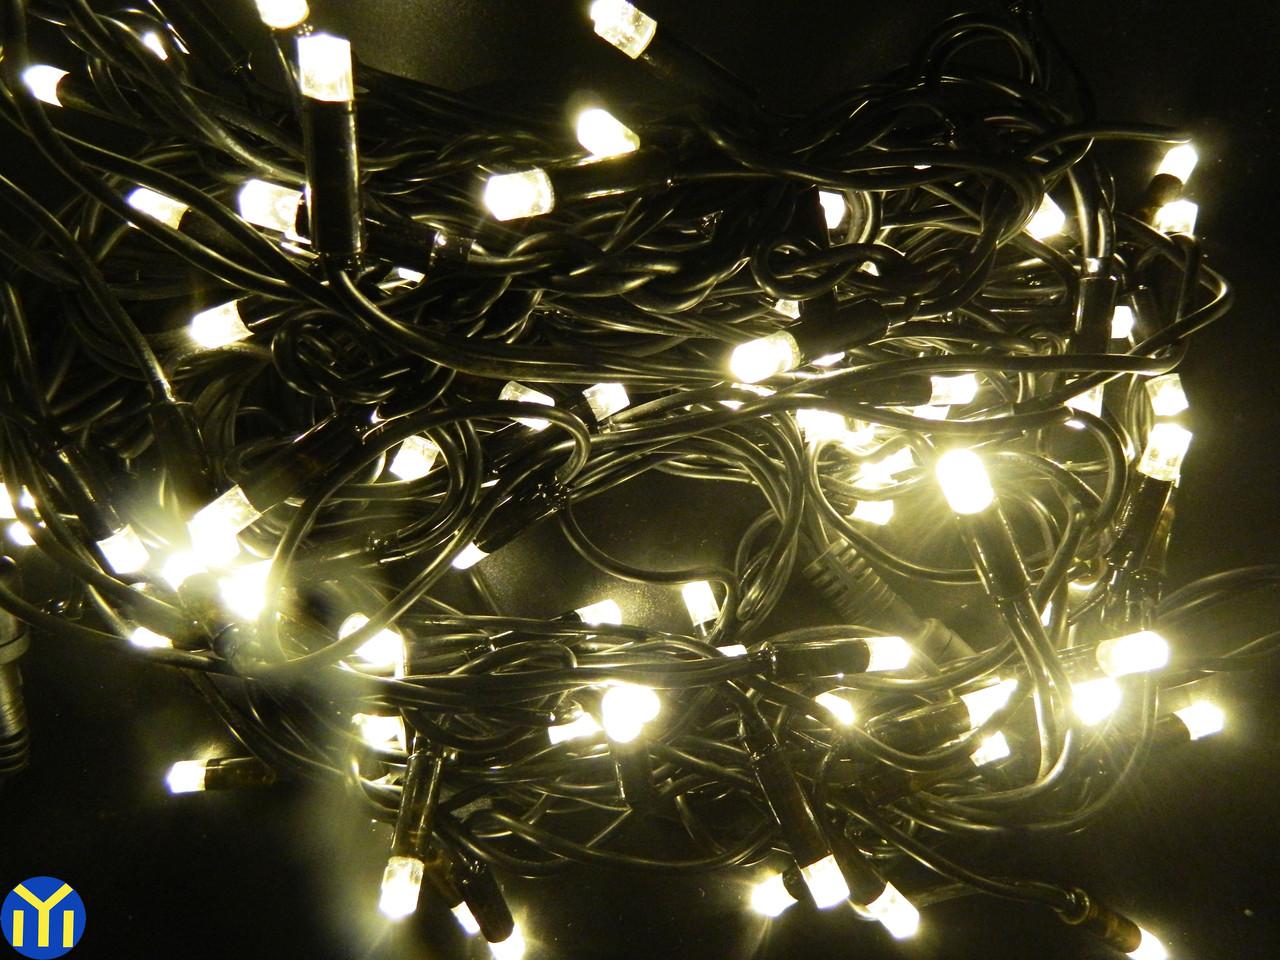 Гирлянда светодиодная Бахрома 80 LED, уличная 3м.  тепло-желтая